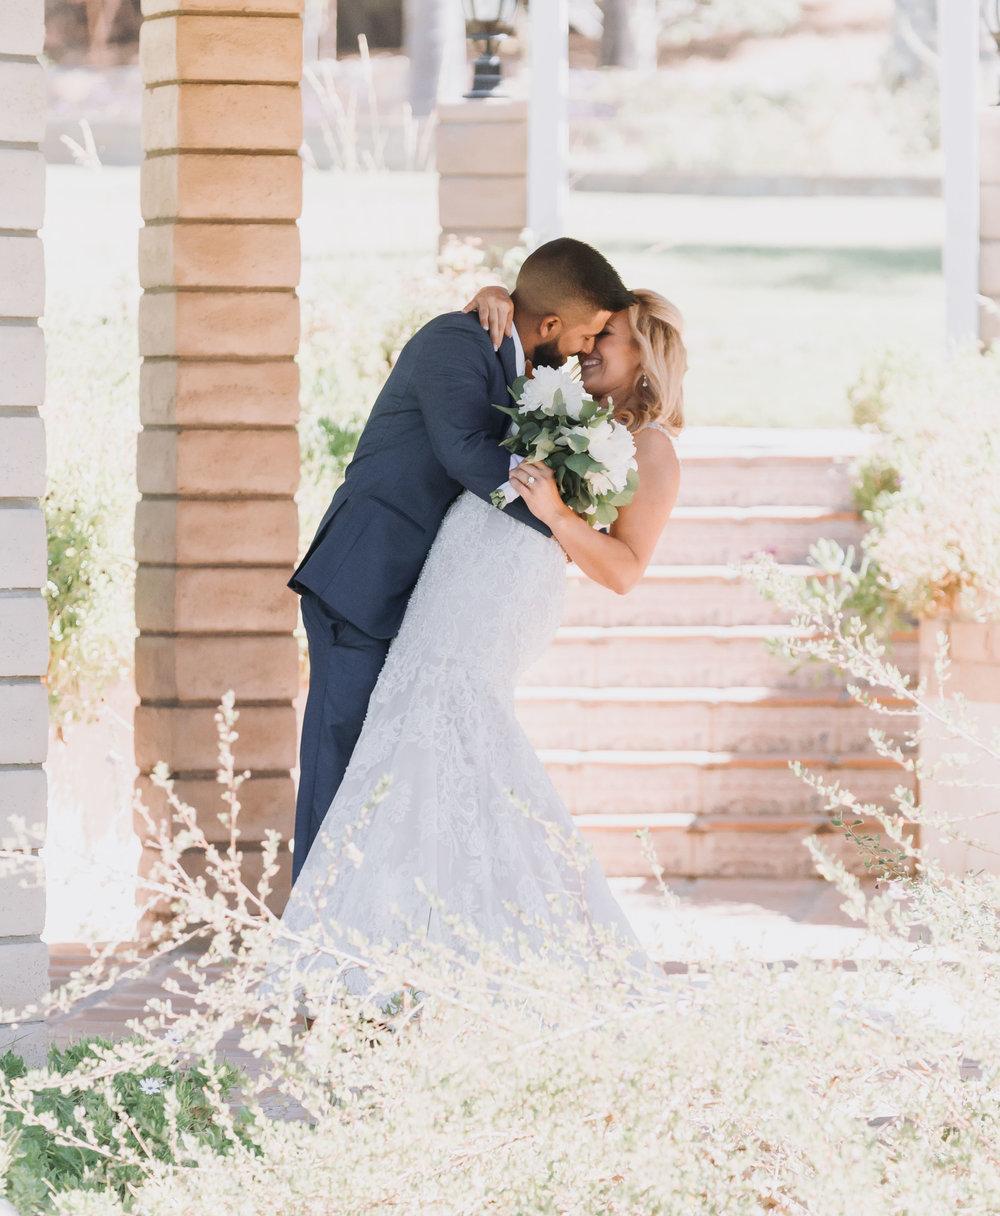 San Diego Wedding Photography | Isaac and Desiree